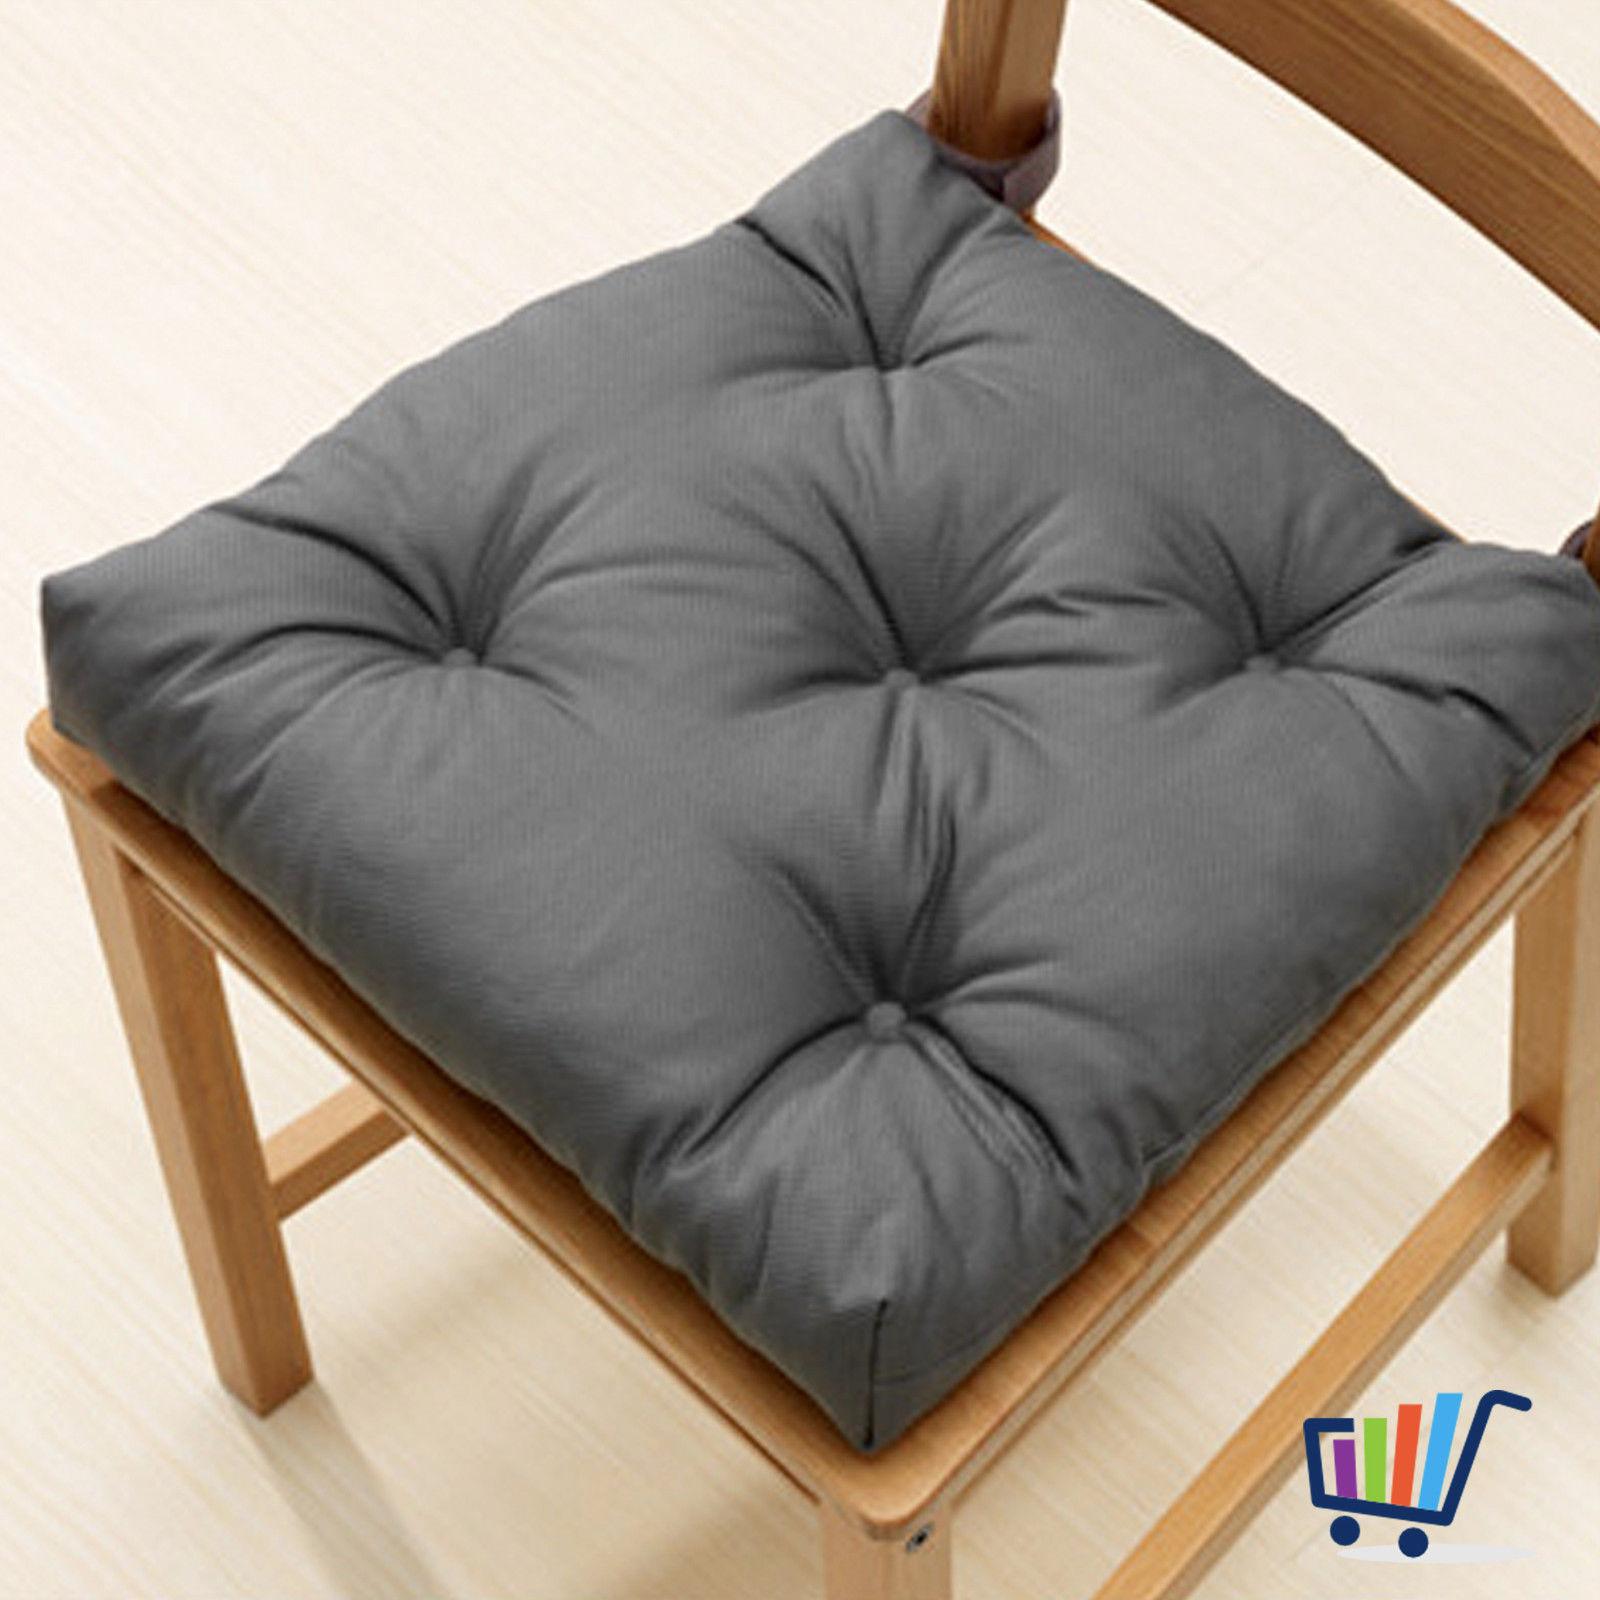 Berühmt Ikea Küchenstuhl Kissen Galerie - Küchenschrank Ideen ...